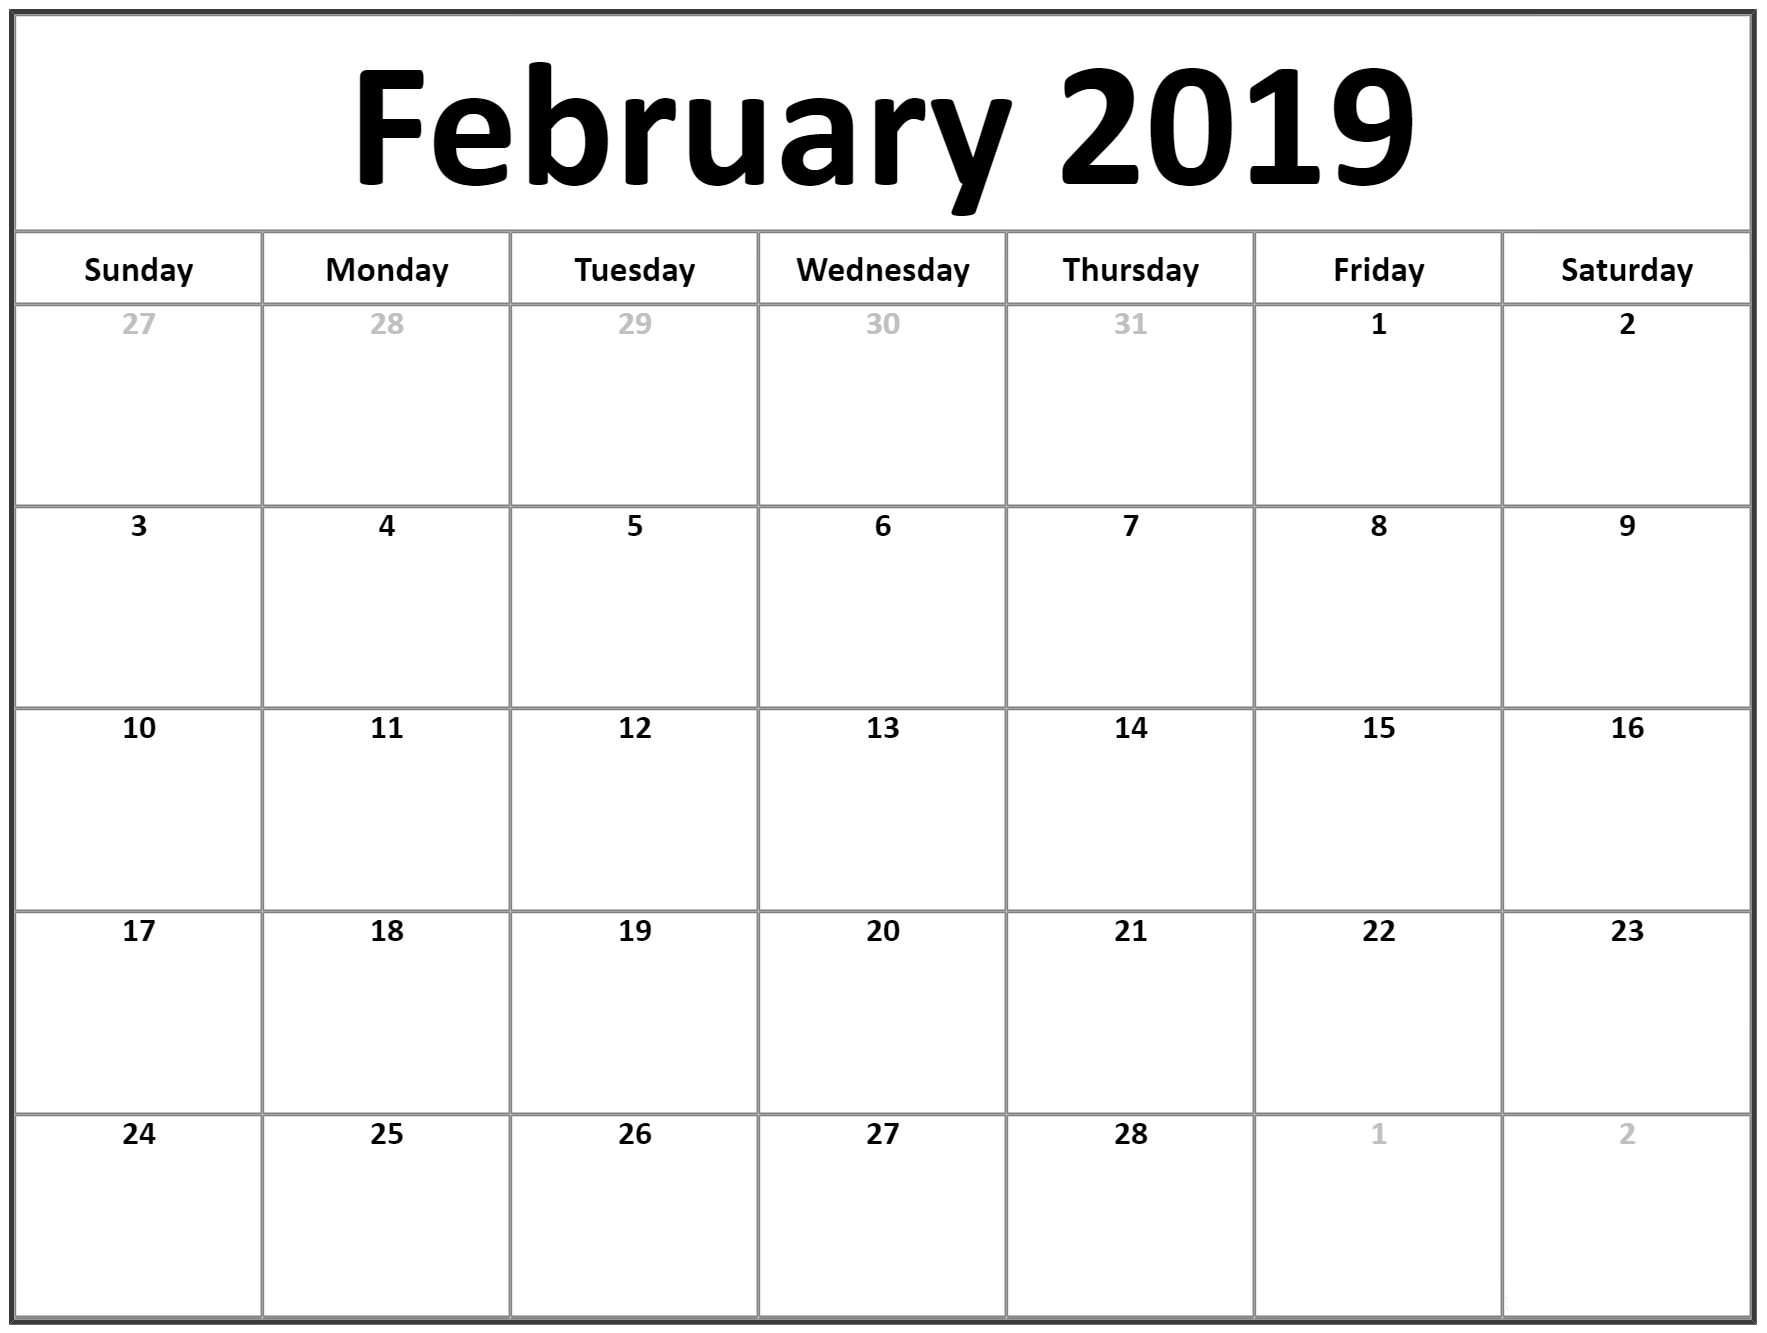 Blank February 2019 Calendar Printable - Free Printable Calendar_Calendar Blank Templates Free